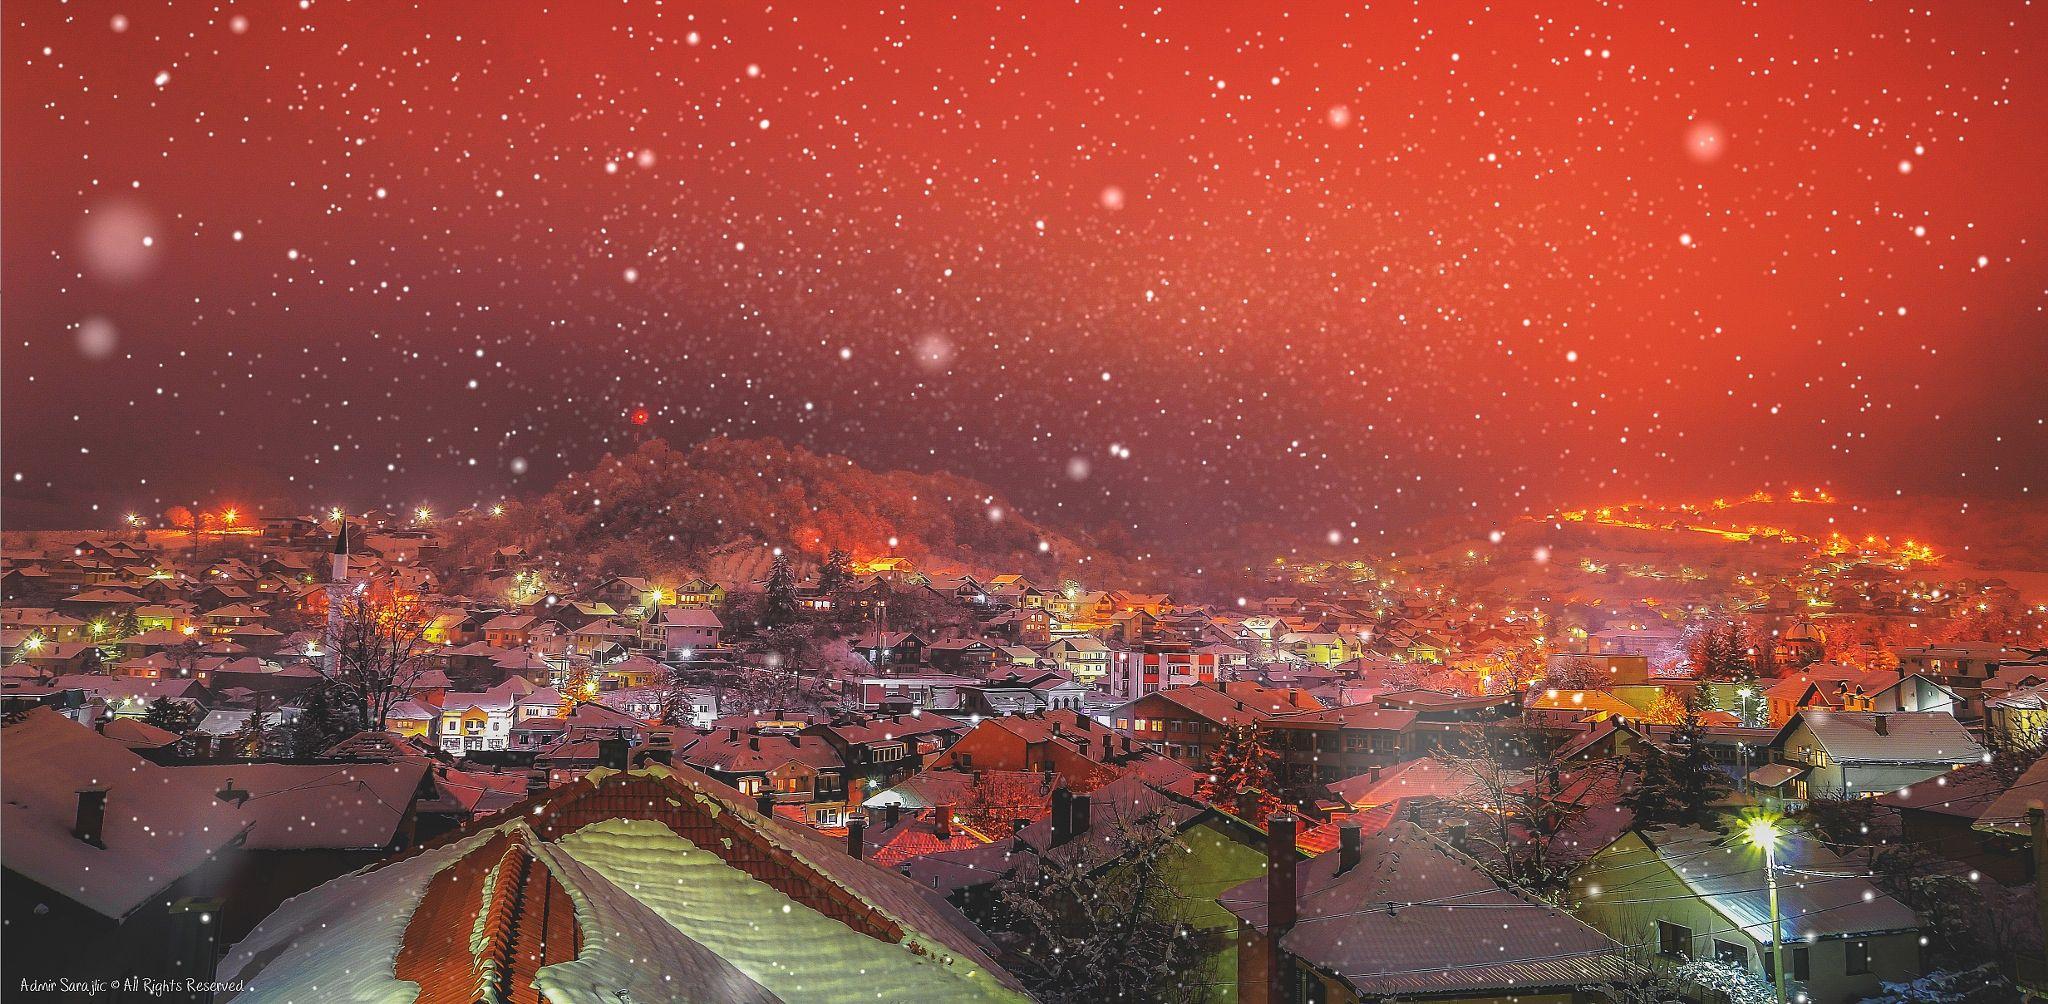 Nostalgic winter night by Admir Sarajlic on 500px